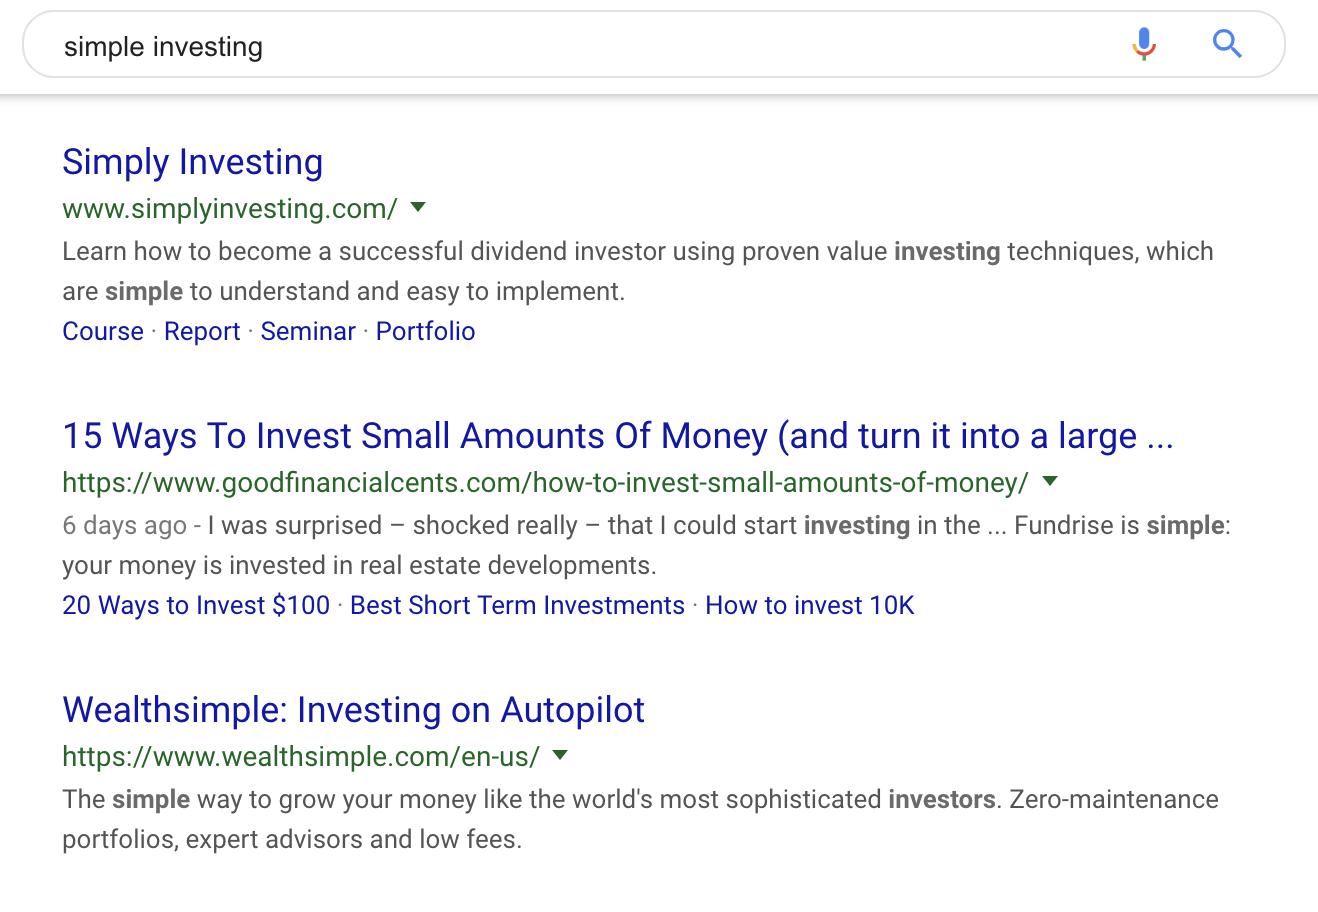 simple investing rank